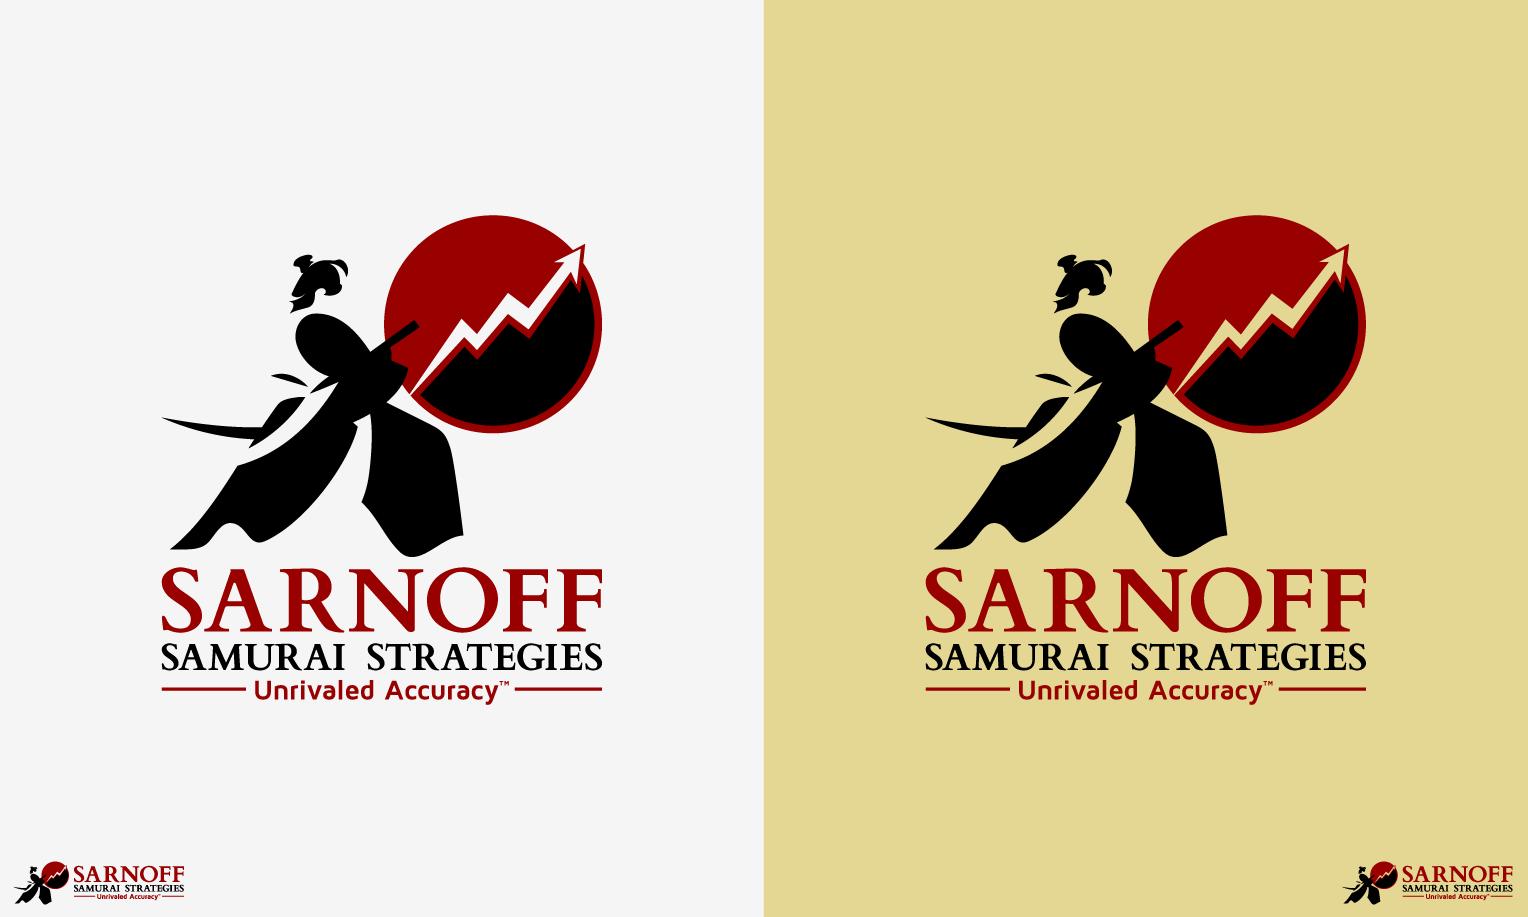 Create a winning logo design for Sarnoff's Samurai Strategies